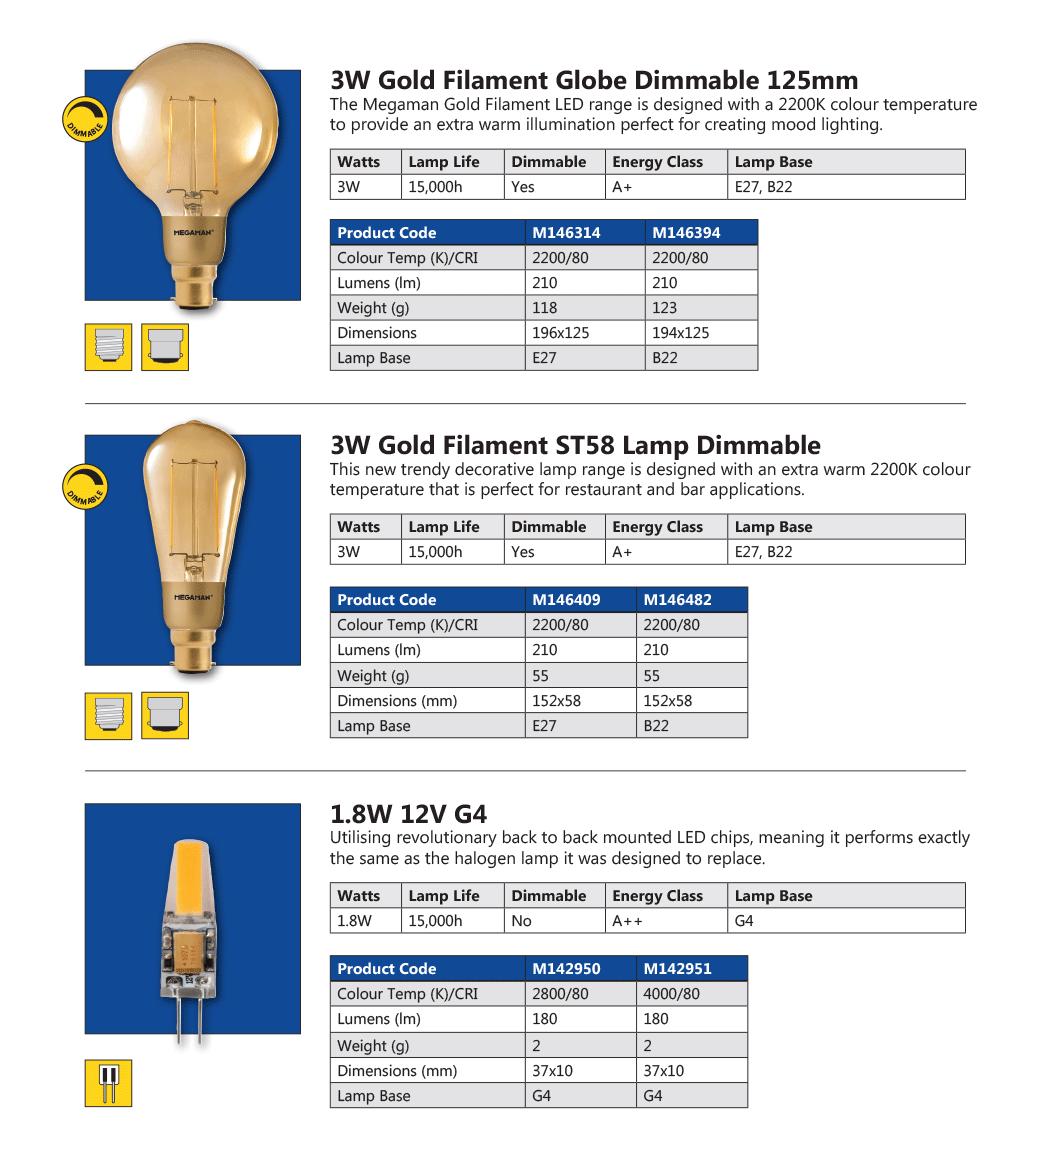 Megaman Gold Filament Range